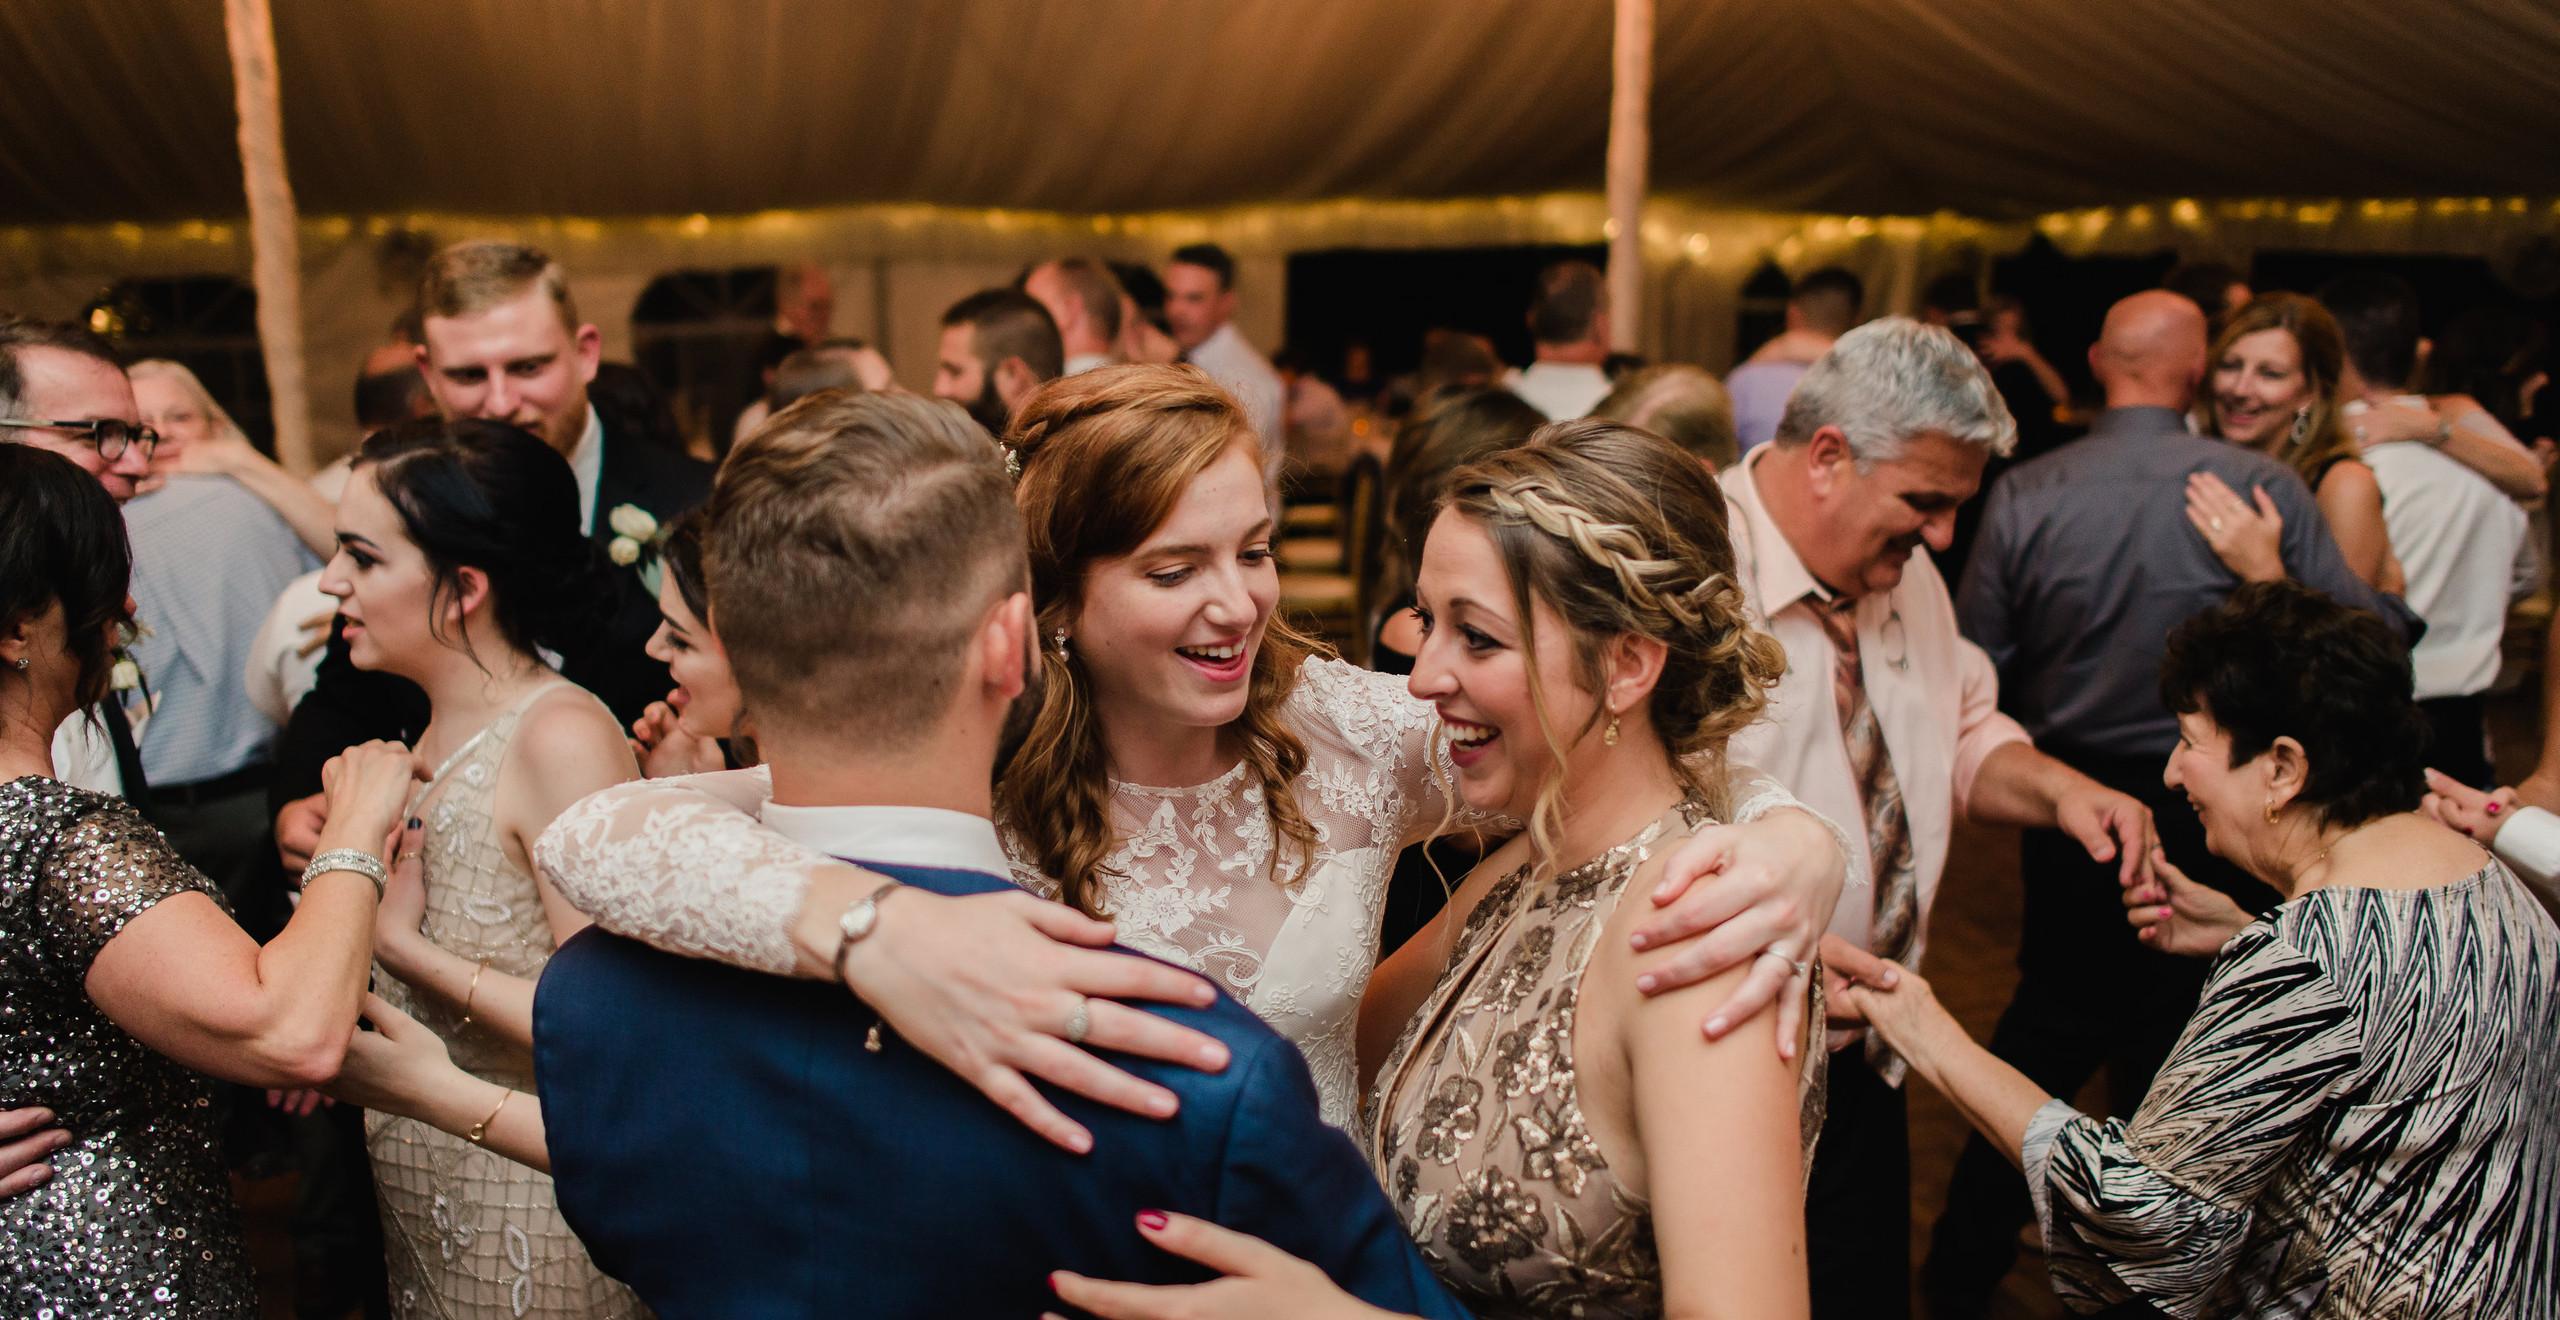 bride hugging friends at wedding while dancing